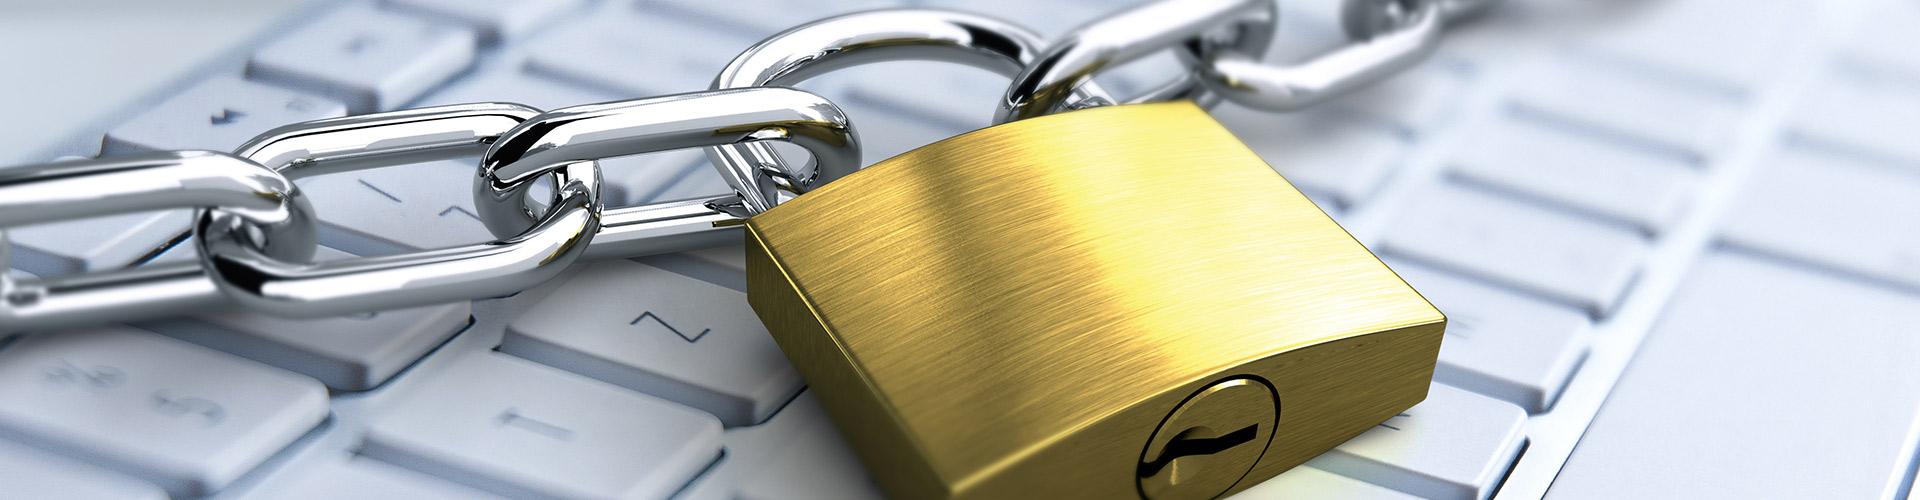 Datenschutzhinweise ASEDO in Dombühl